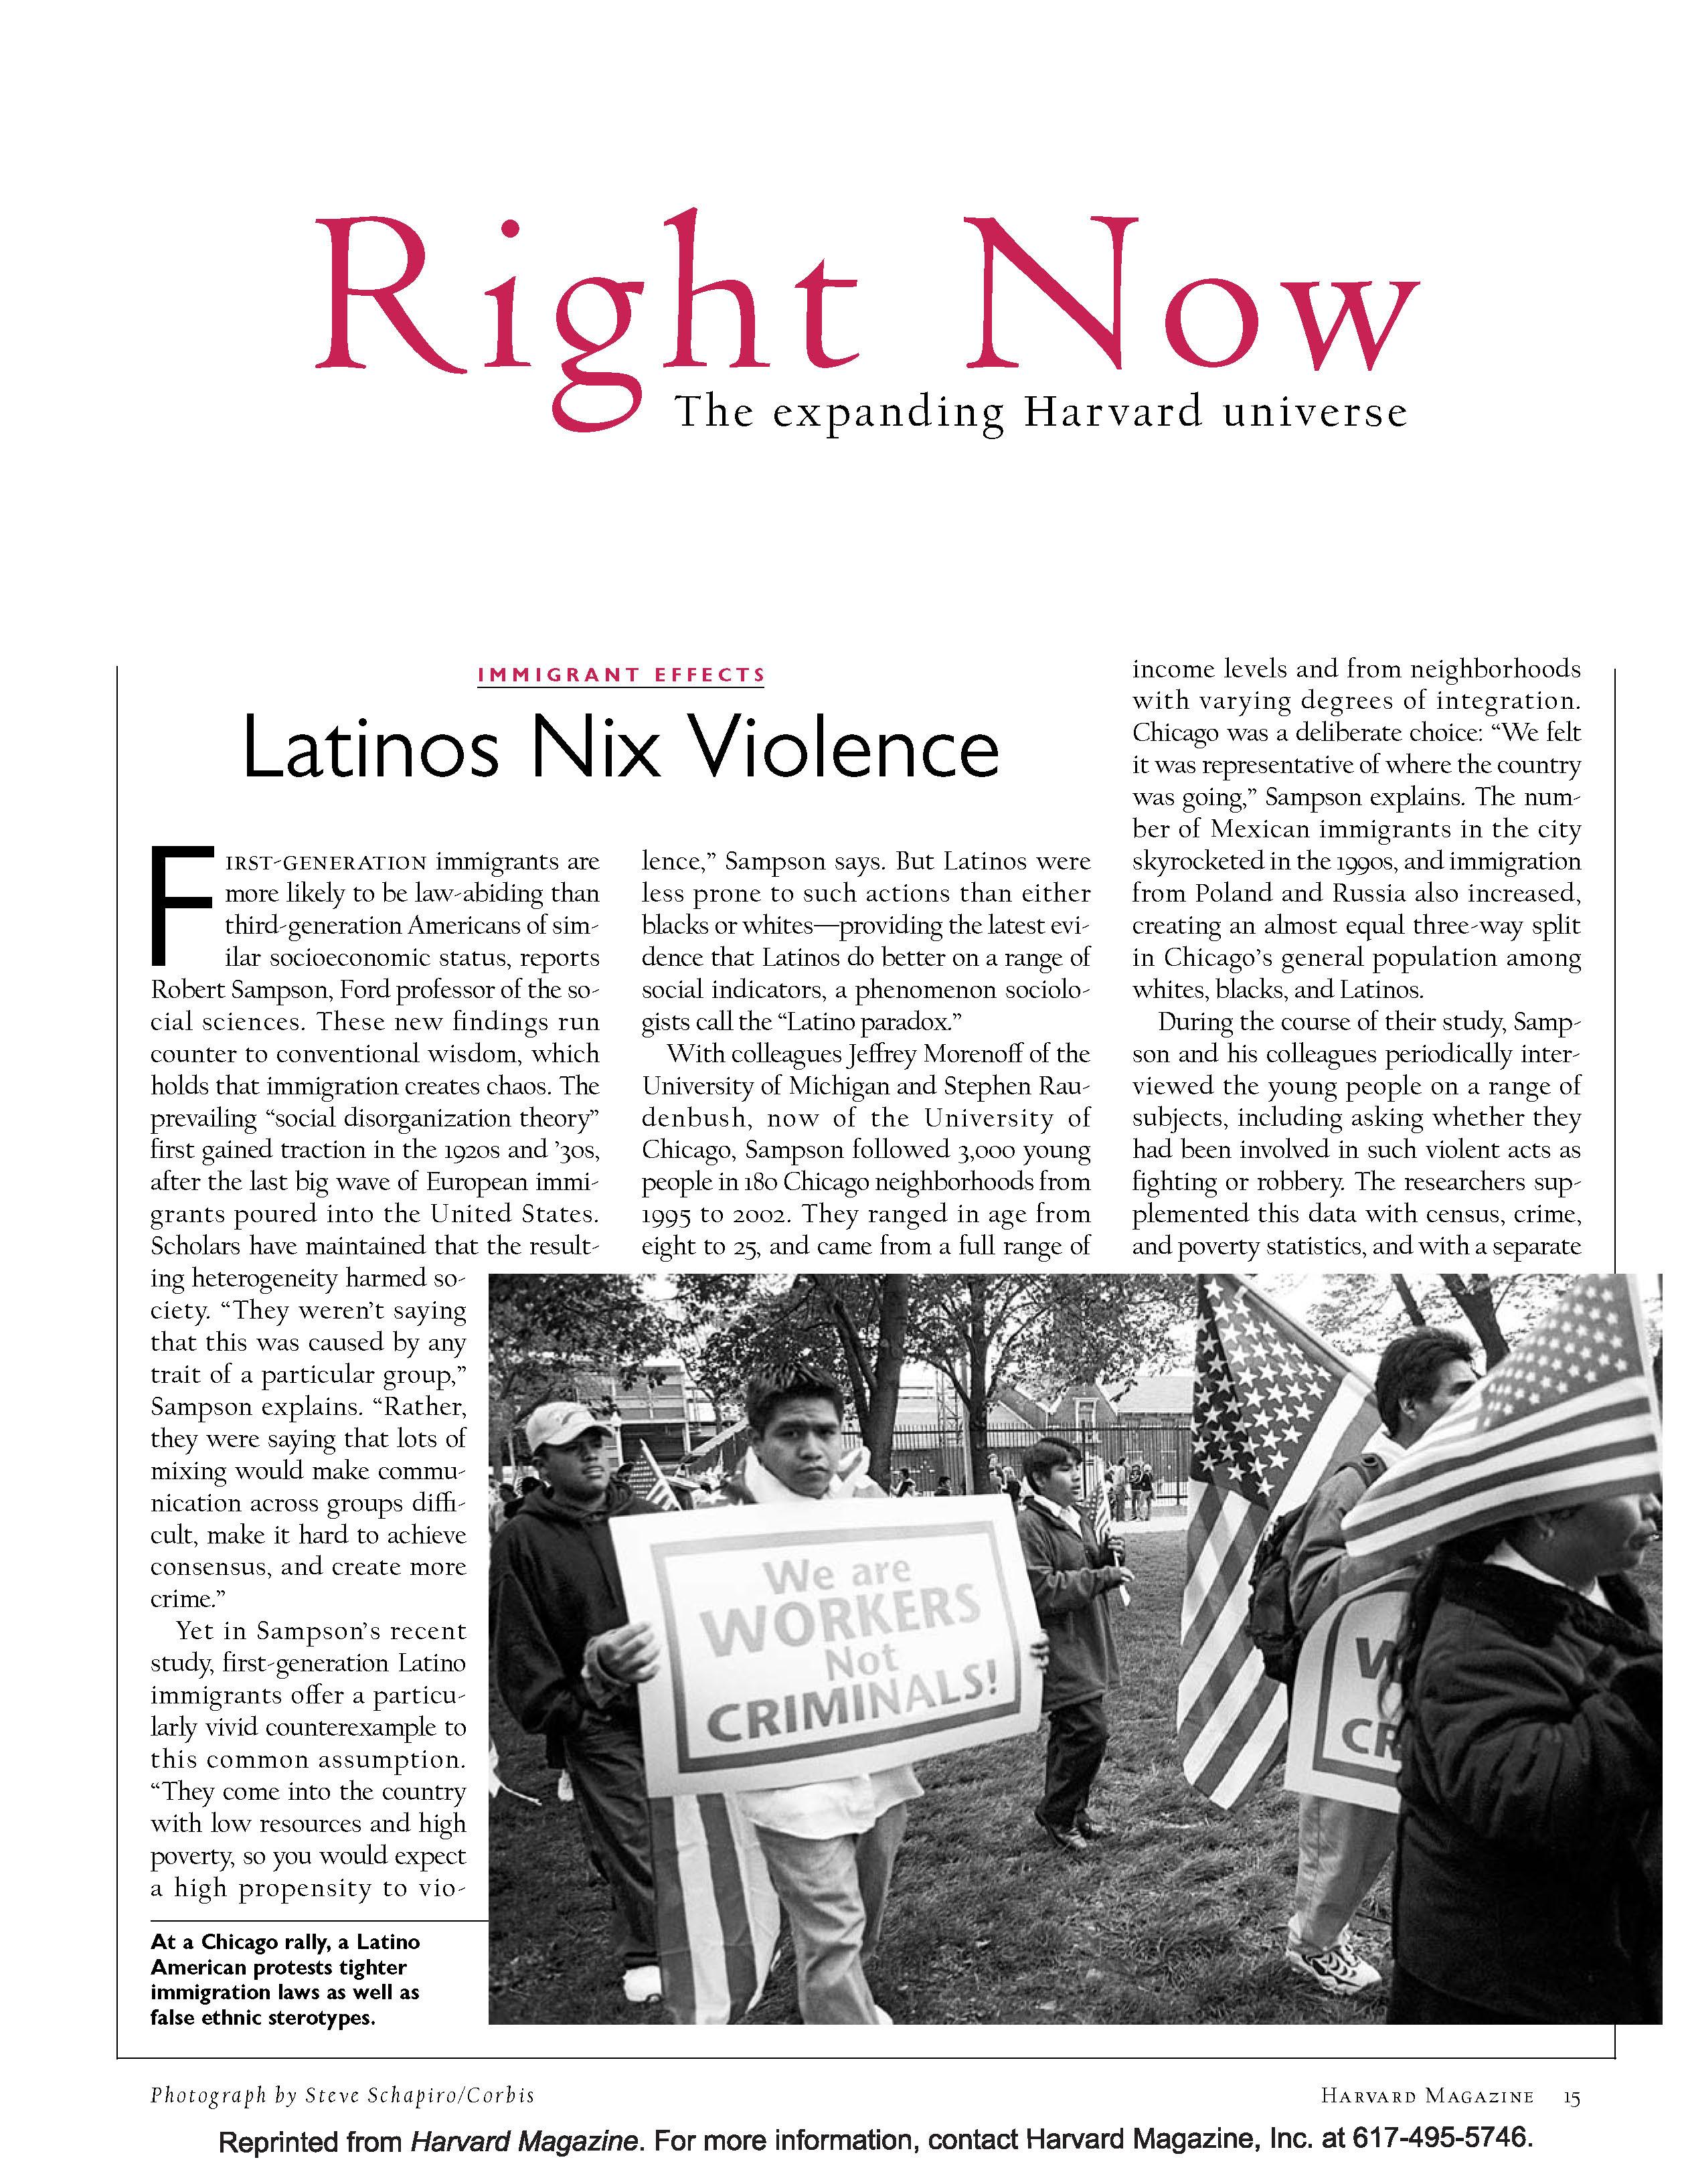 Latinos Nix Violence